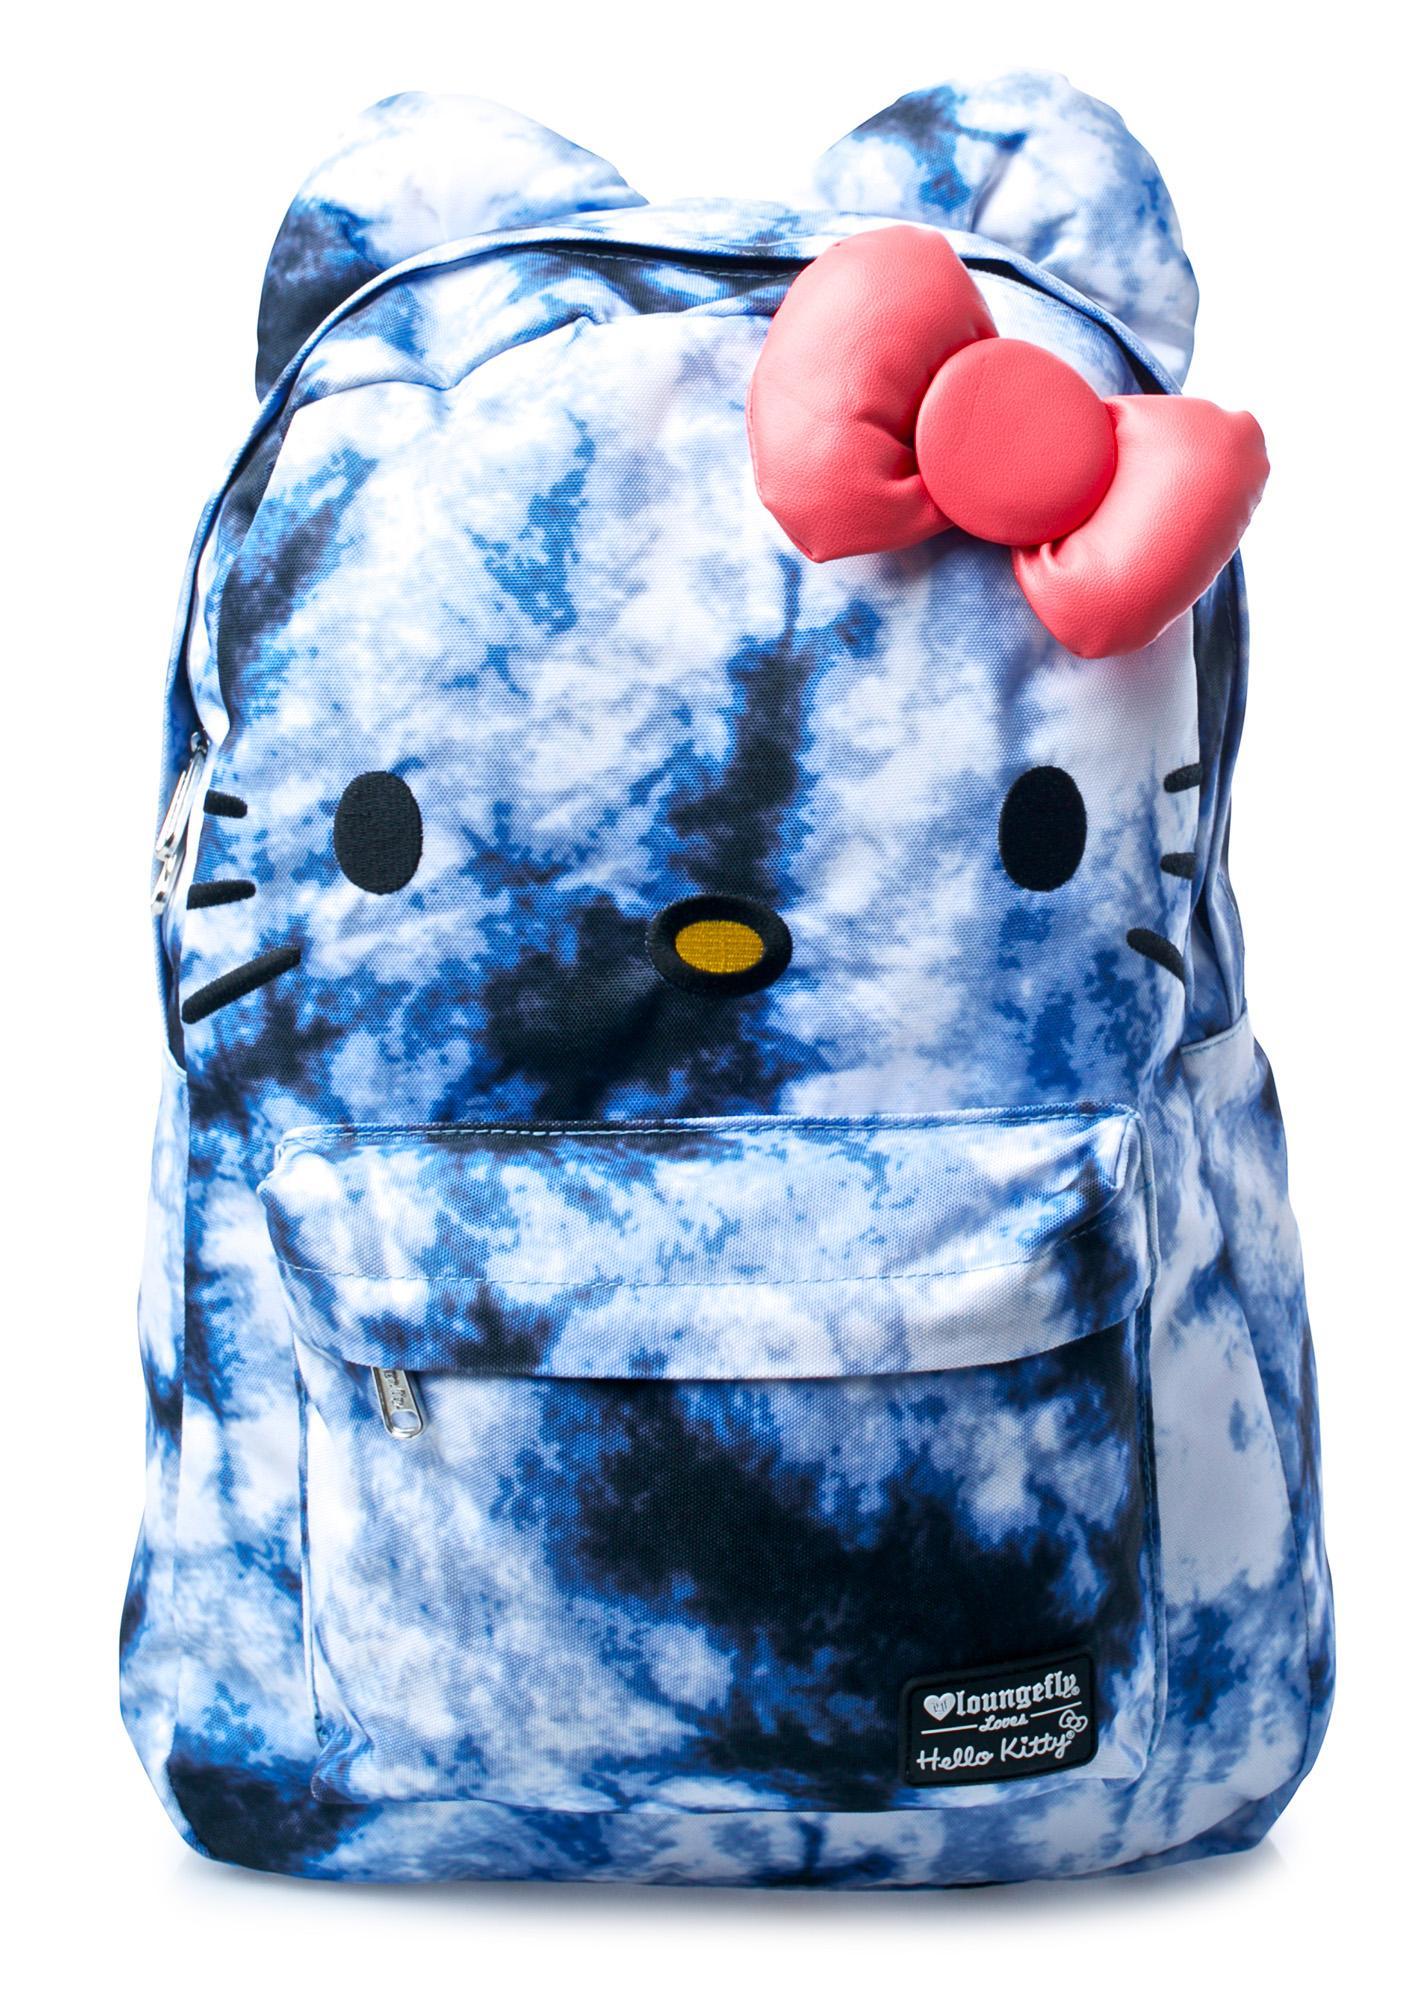 Loungefly Hello Kitty Tie Dye Backpack